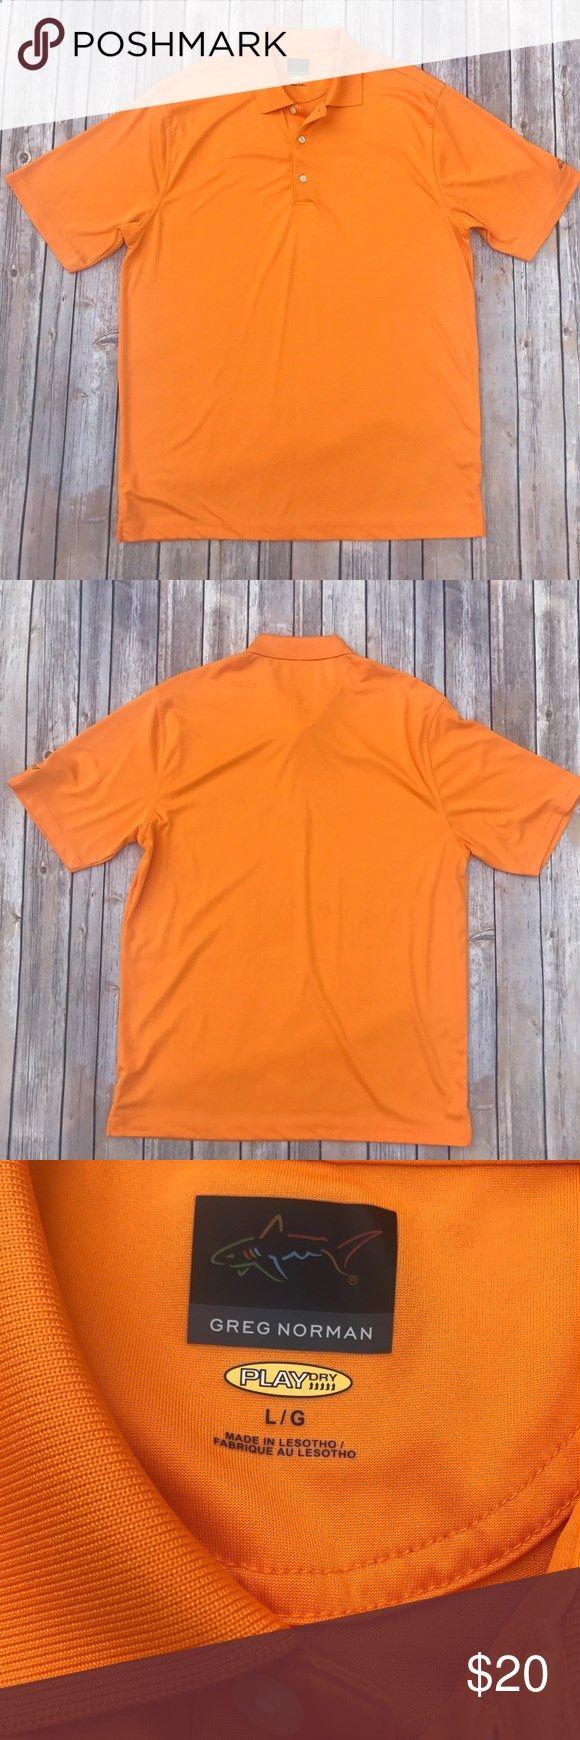 Greg Norman Play Dry Golf Shirt. Size L Greg Norman Play Dry Orange Golf Shirt. Size L Greg Norman Shirts Polos